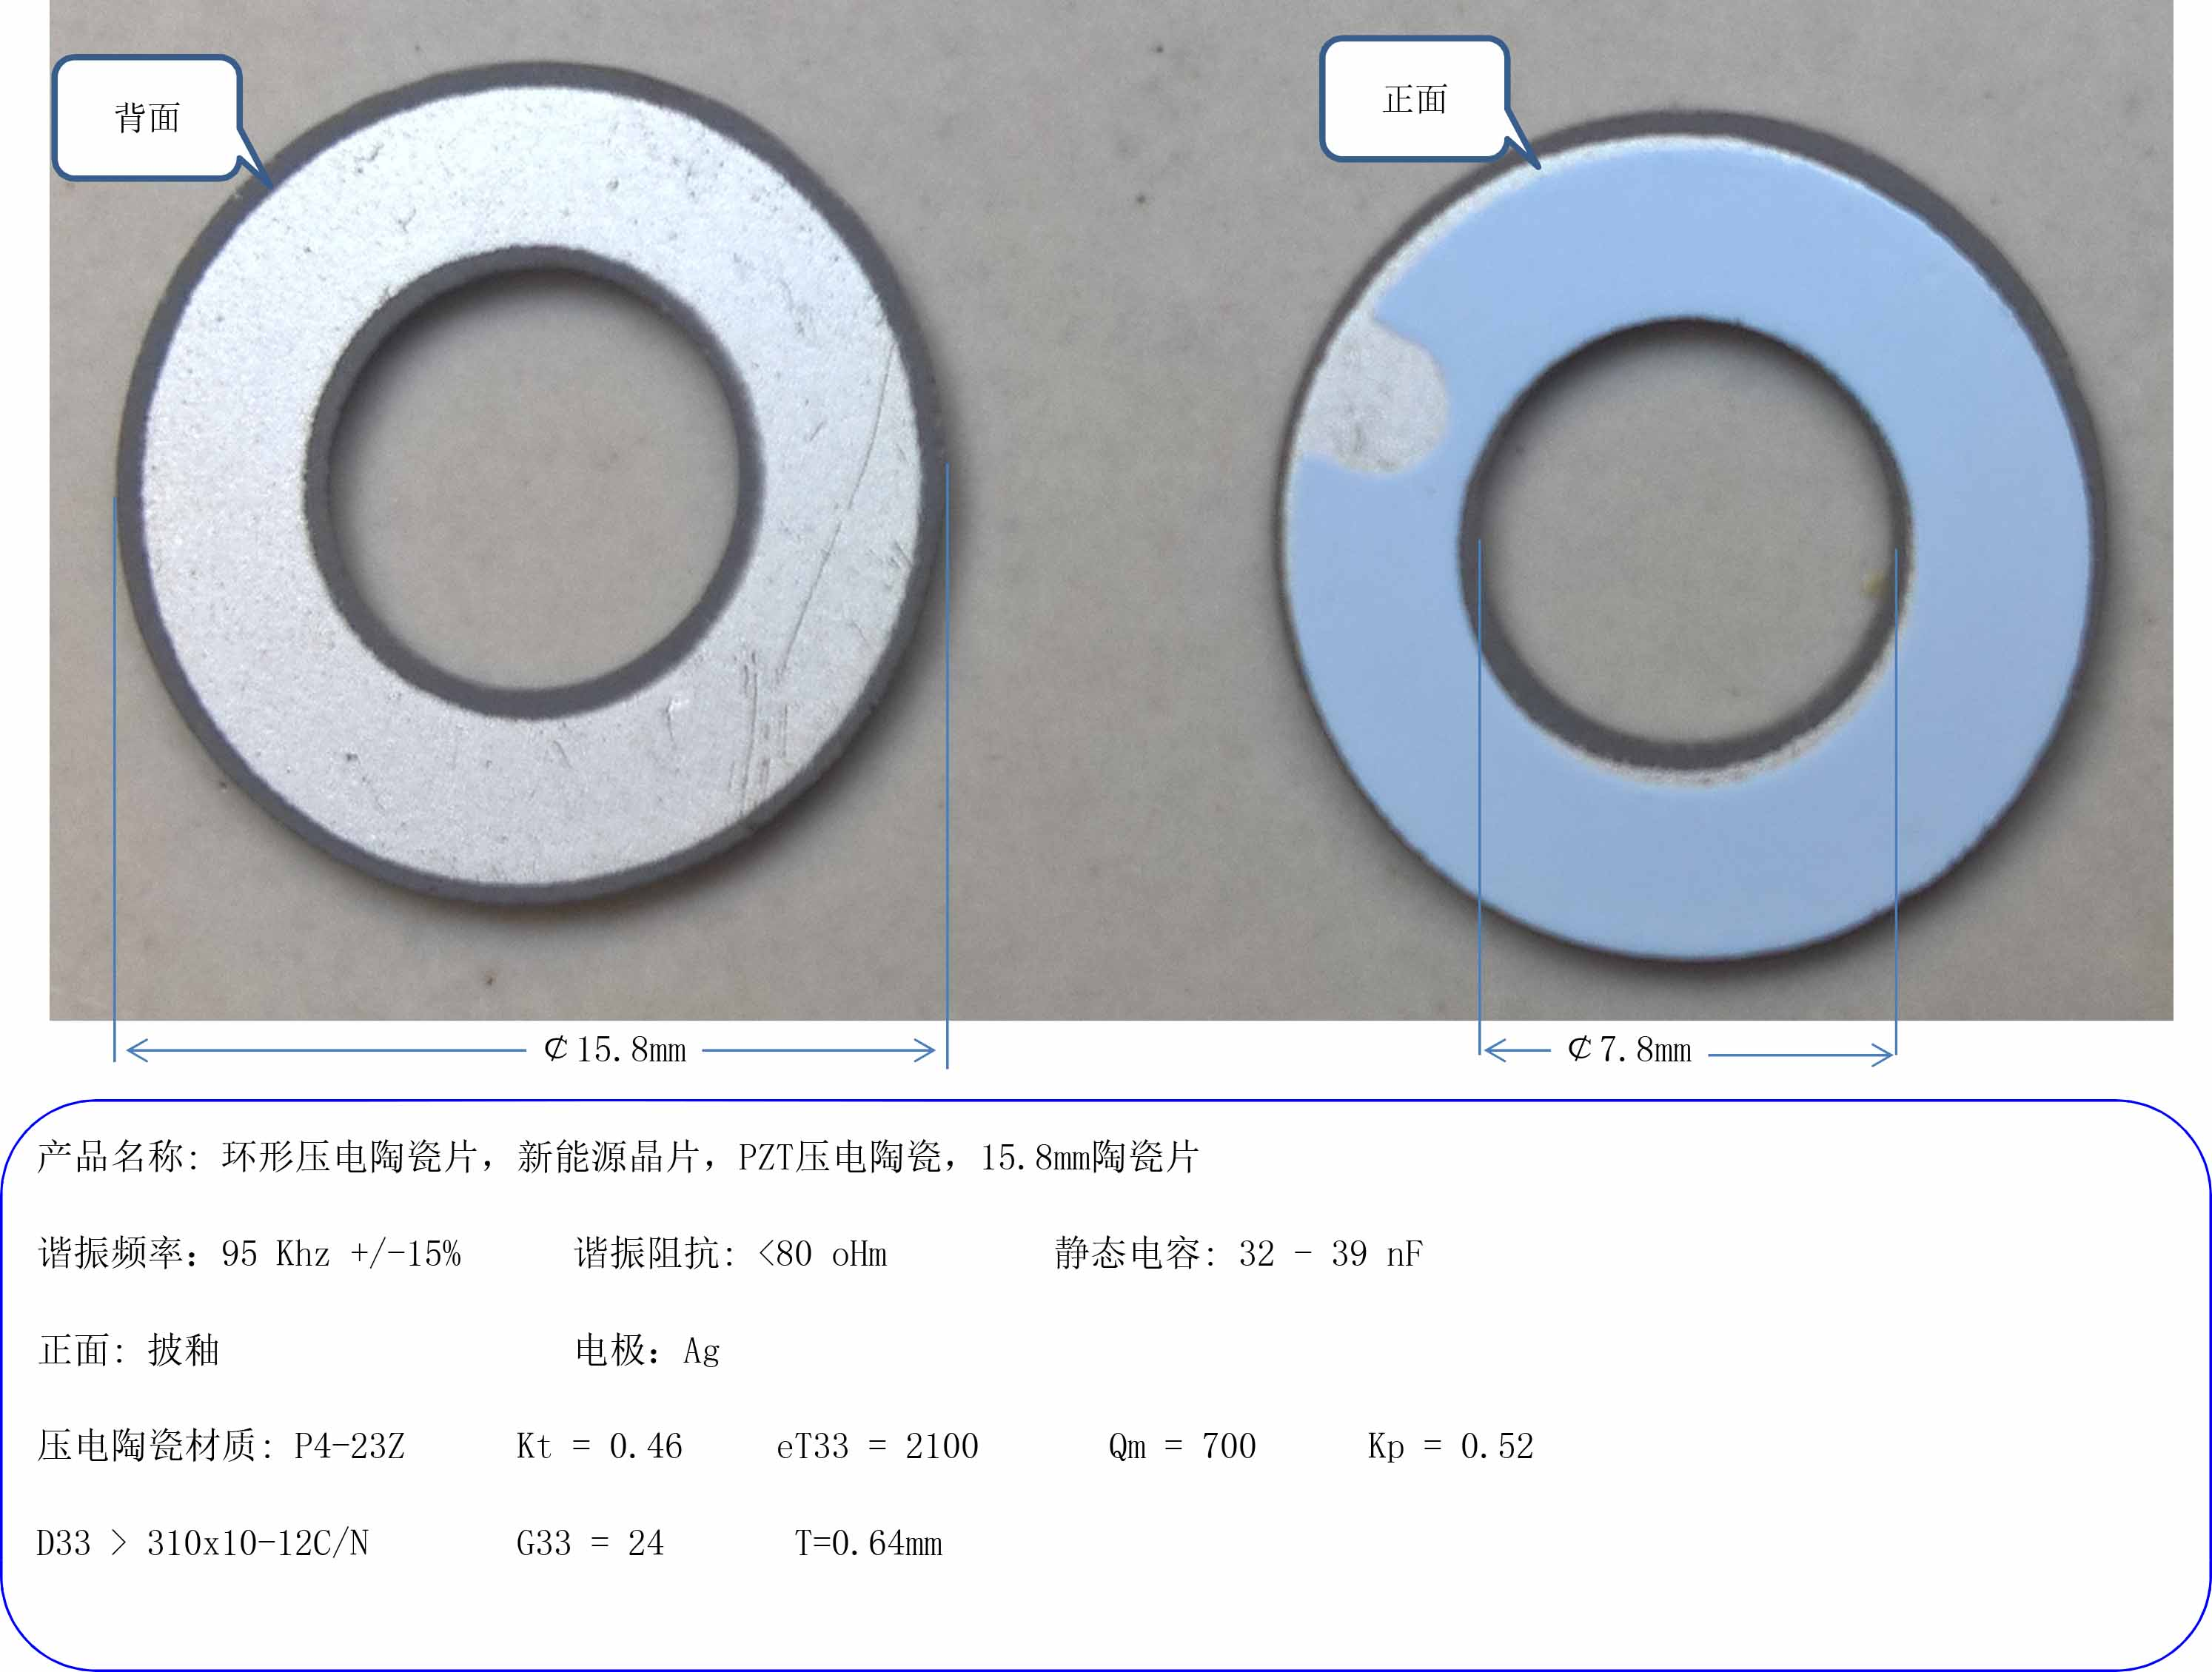 Ring piezoelectric ceramic, new energy chip, PZT piezoelectric ceramic, 15.8mm ceramic sheet